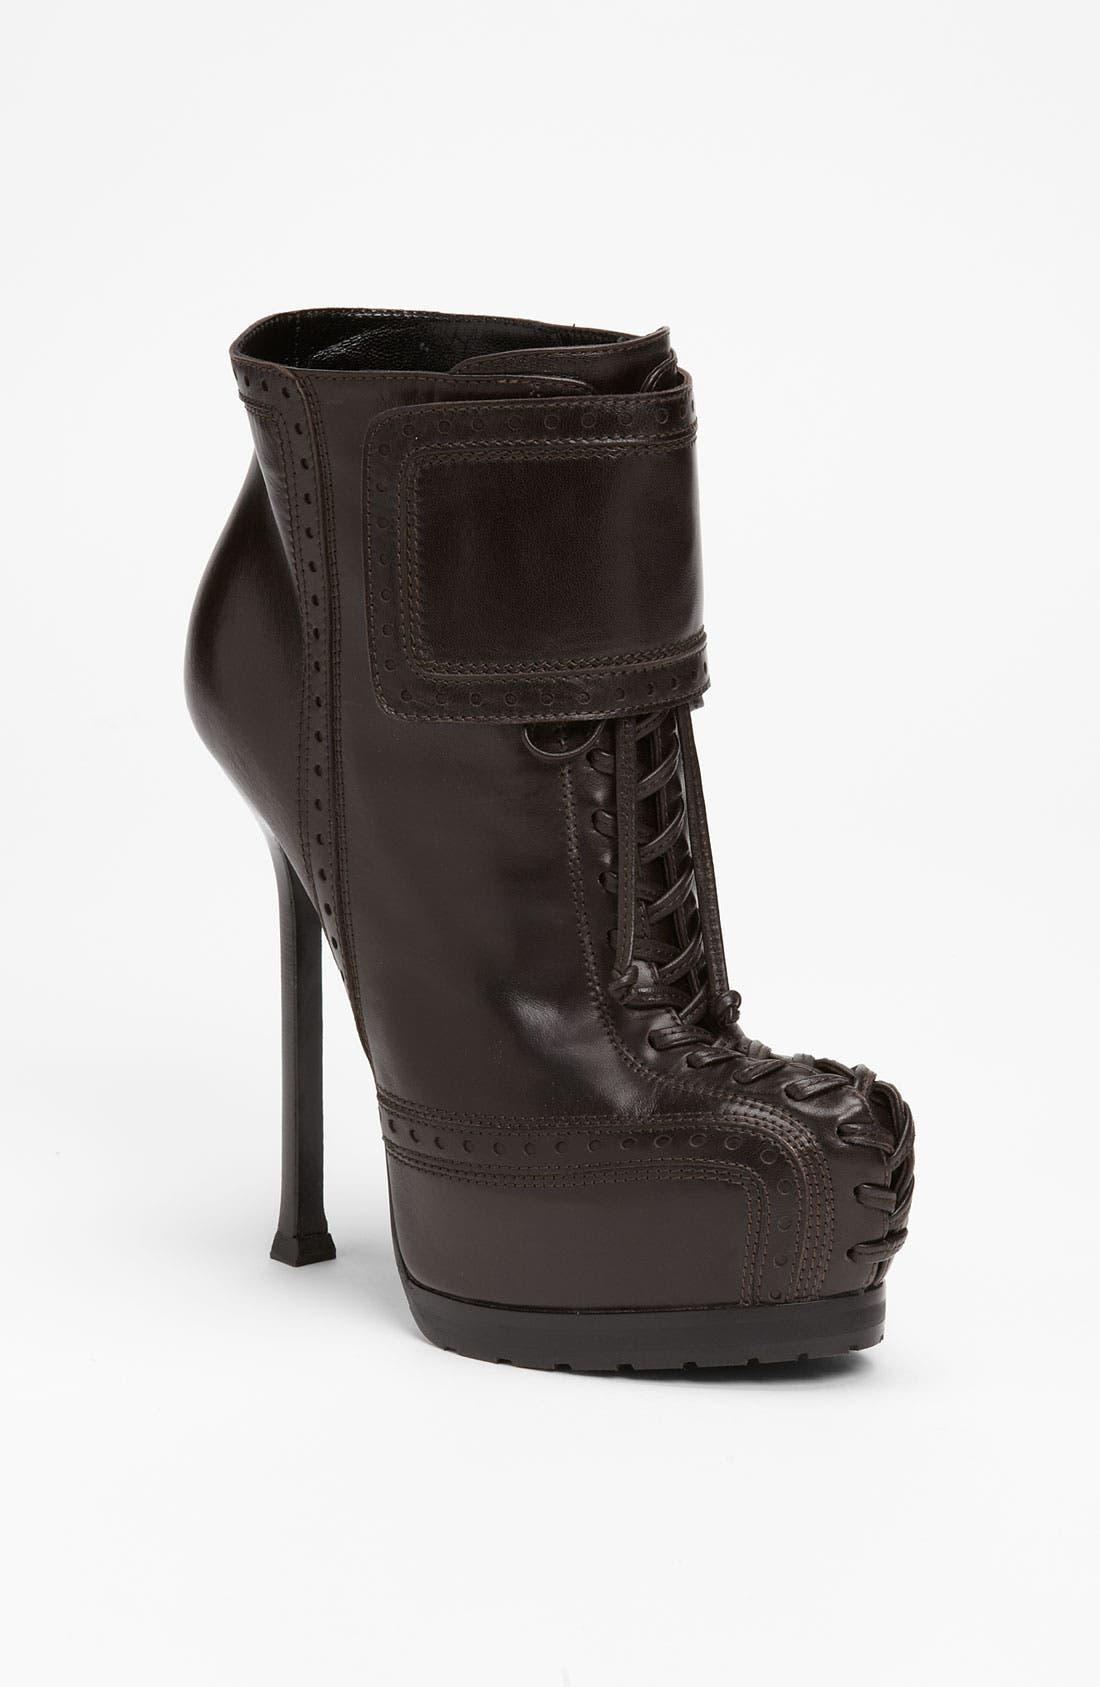 Main Image - Yves Saint Laurent 'Tribtoo' Ankle Boot